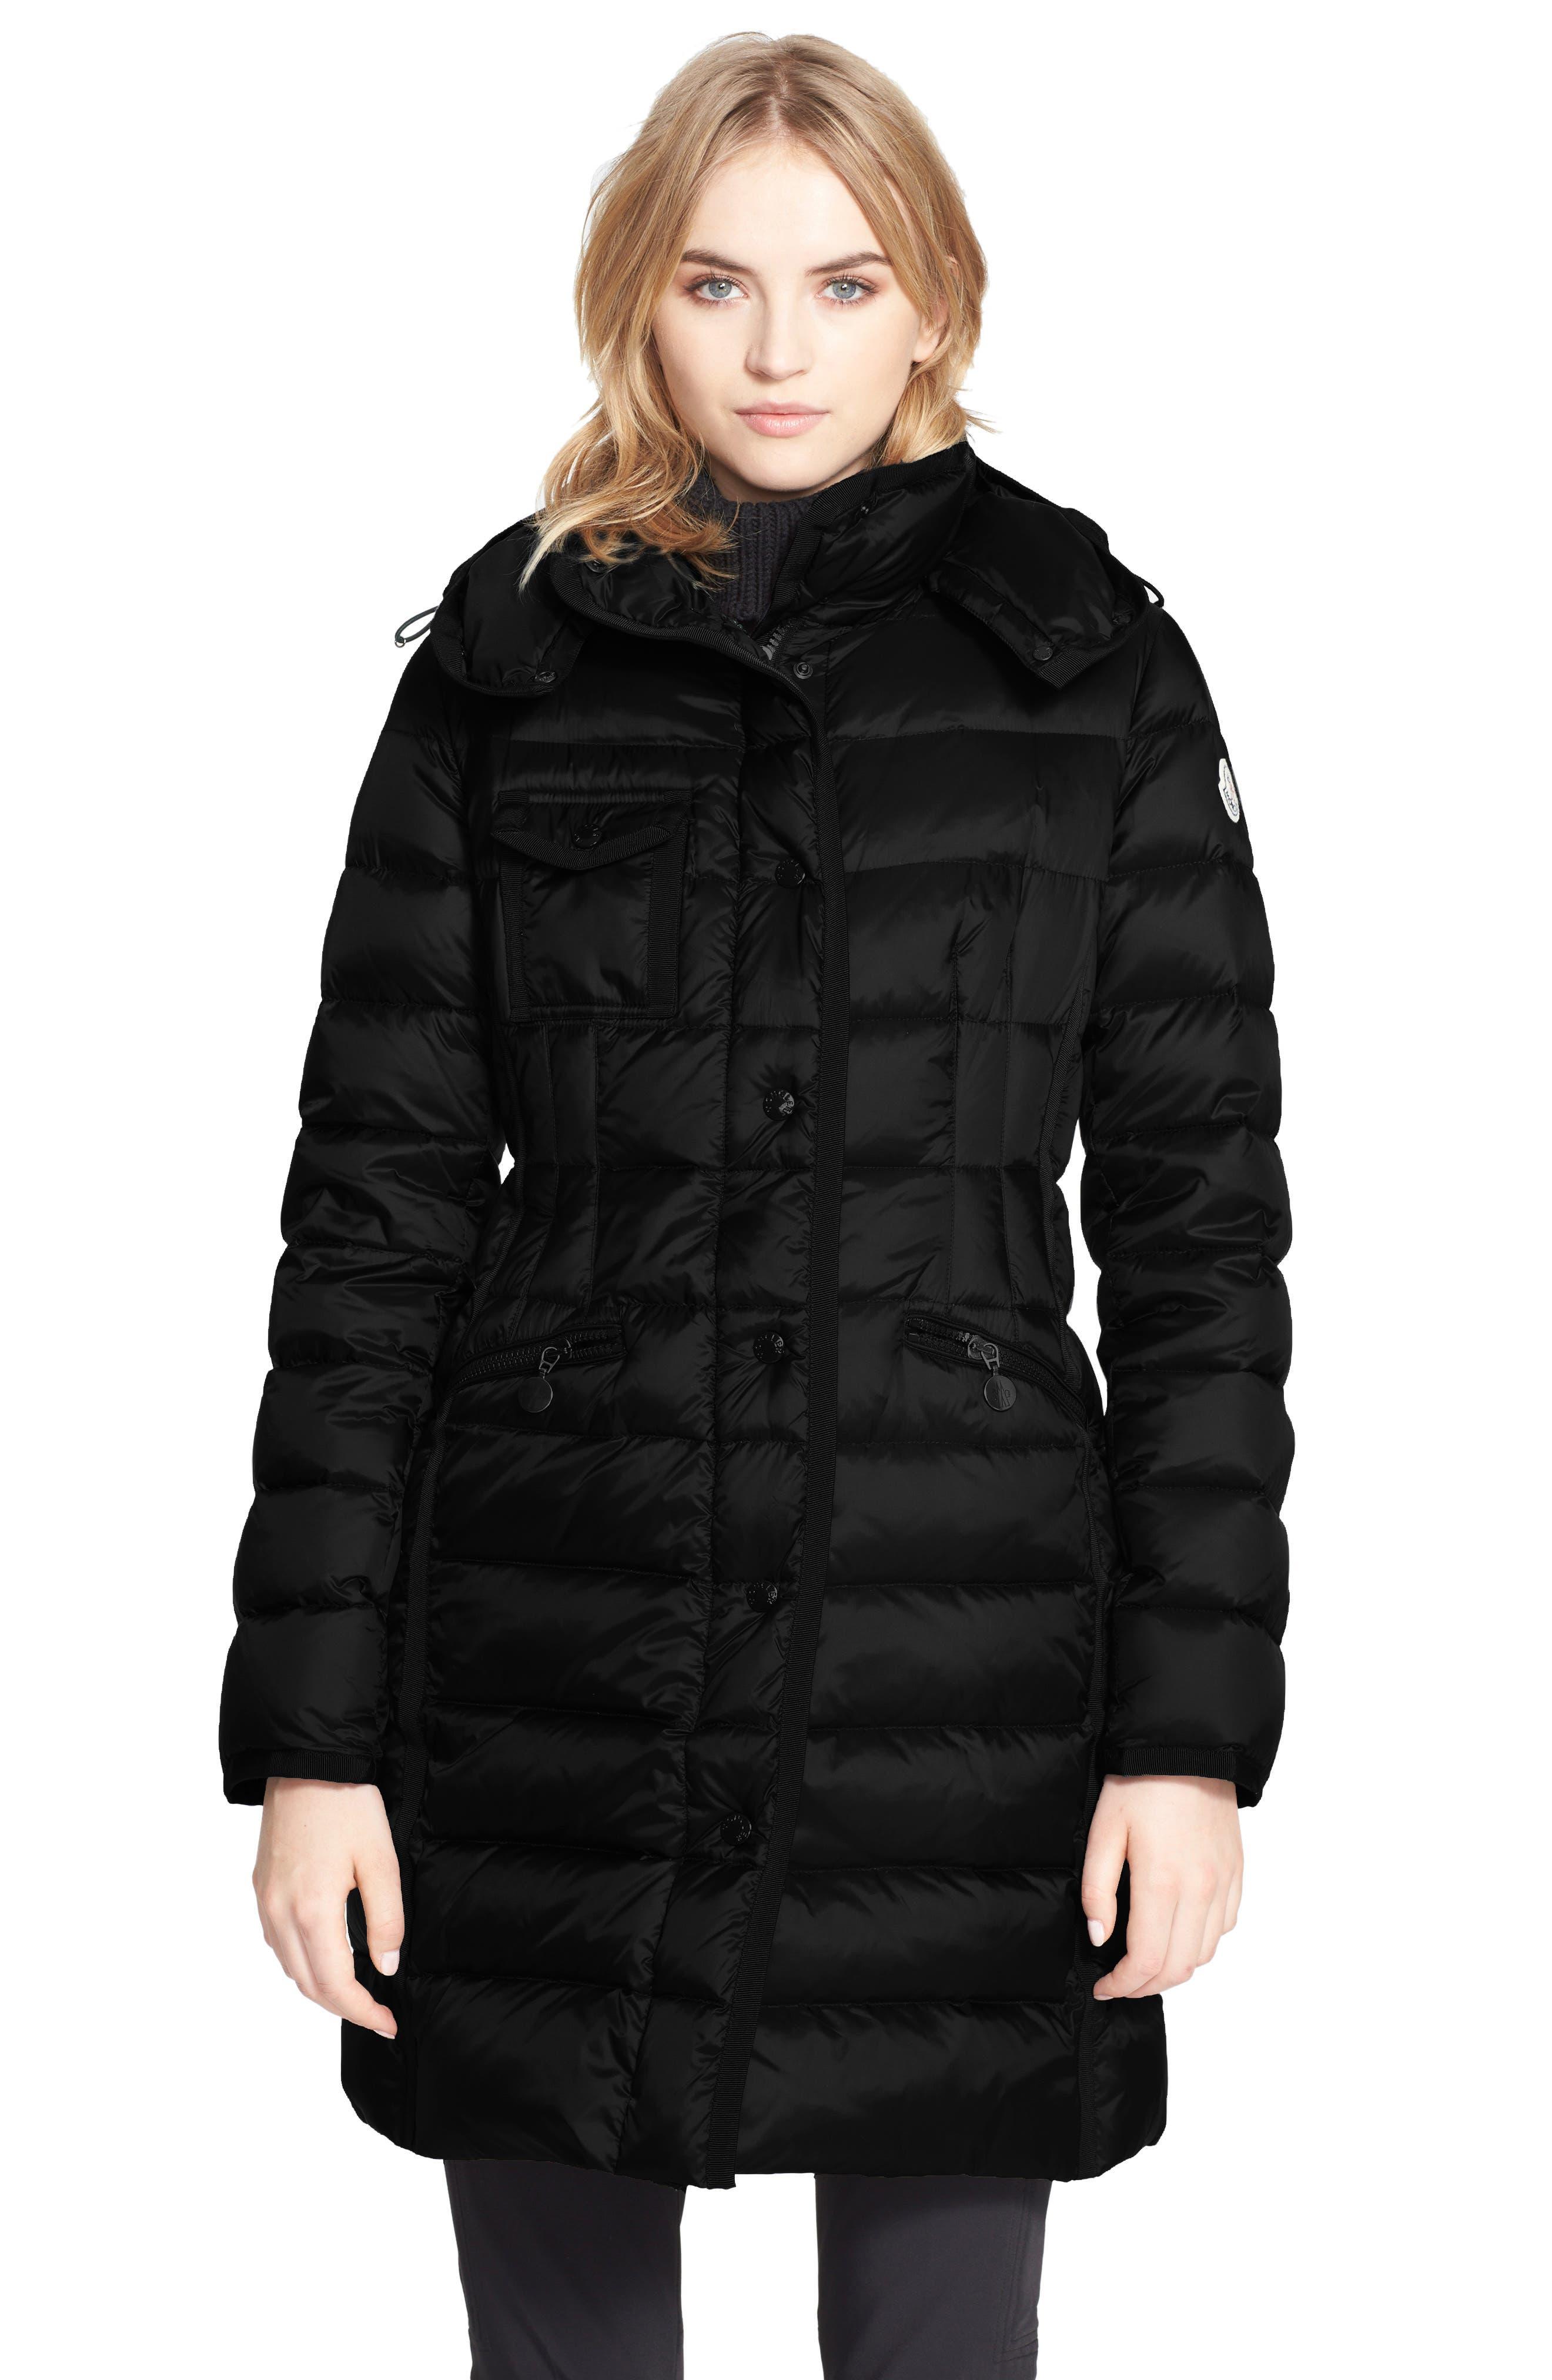 'Hermine' Grosgrain Trim Water Resistant Down Coat,                         Main,                         color, Black